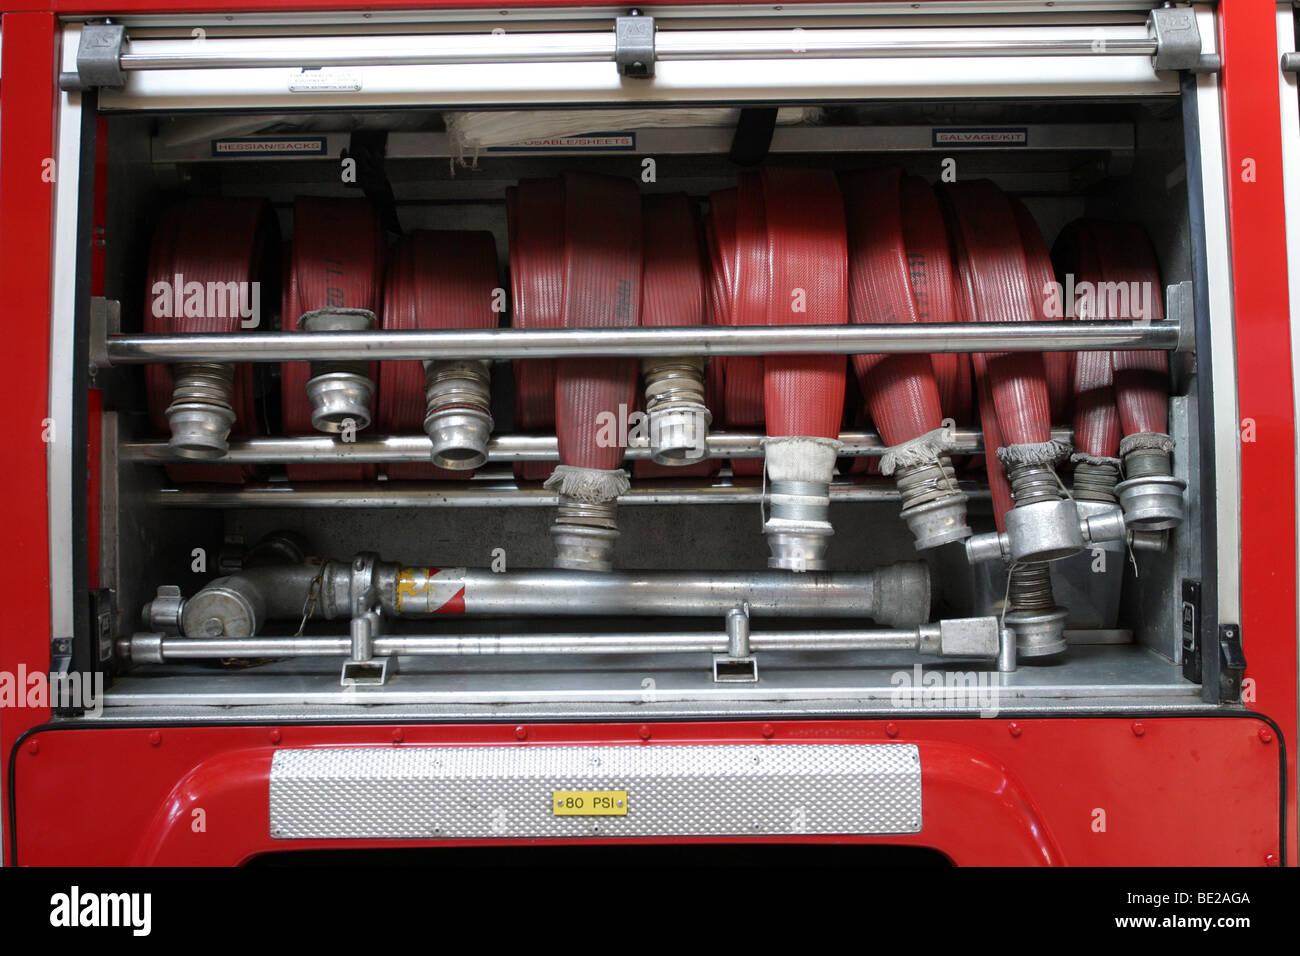 Hoses inside a fire engine - Stock Image